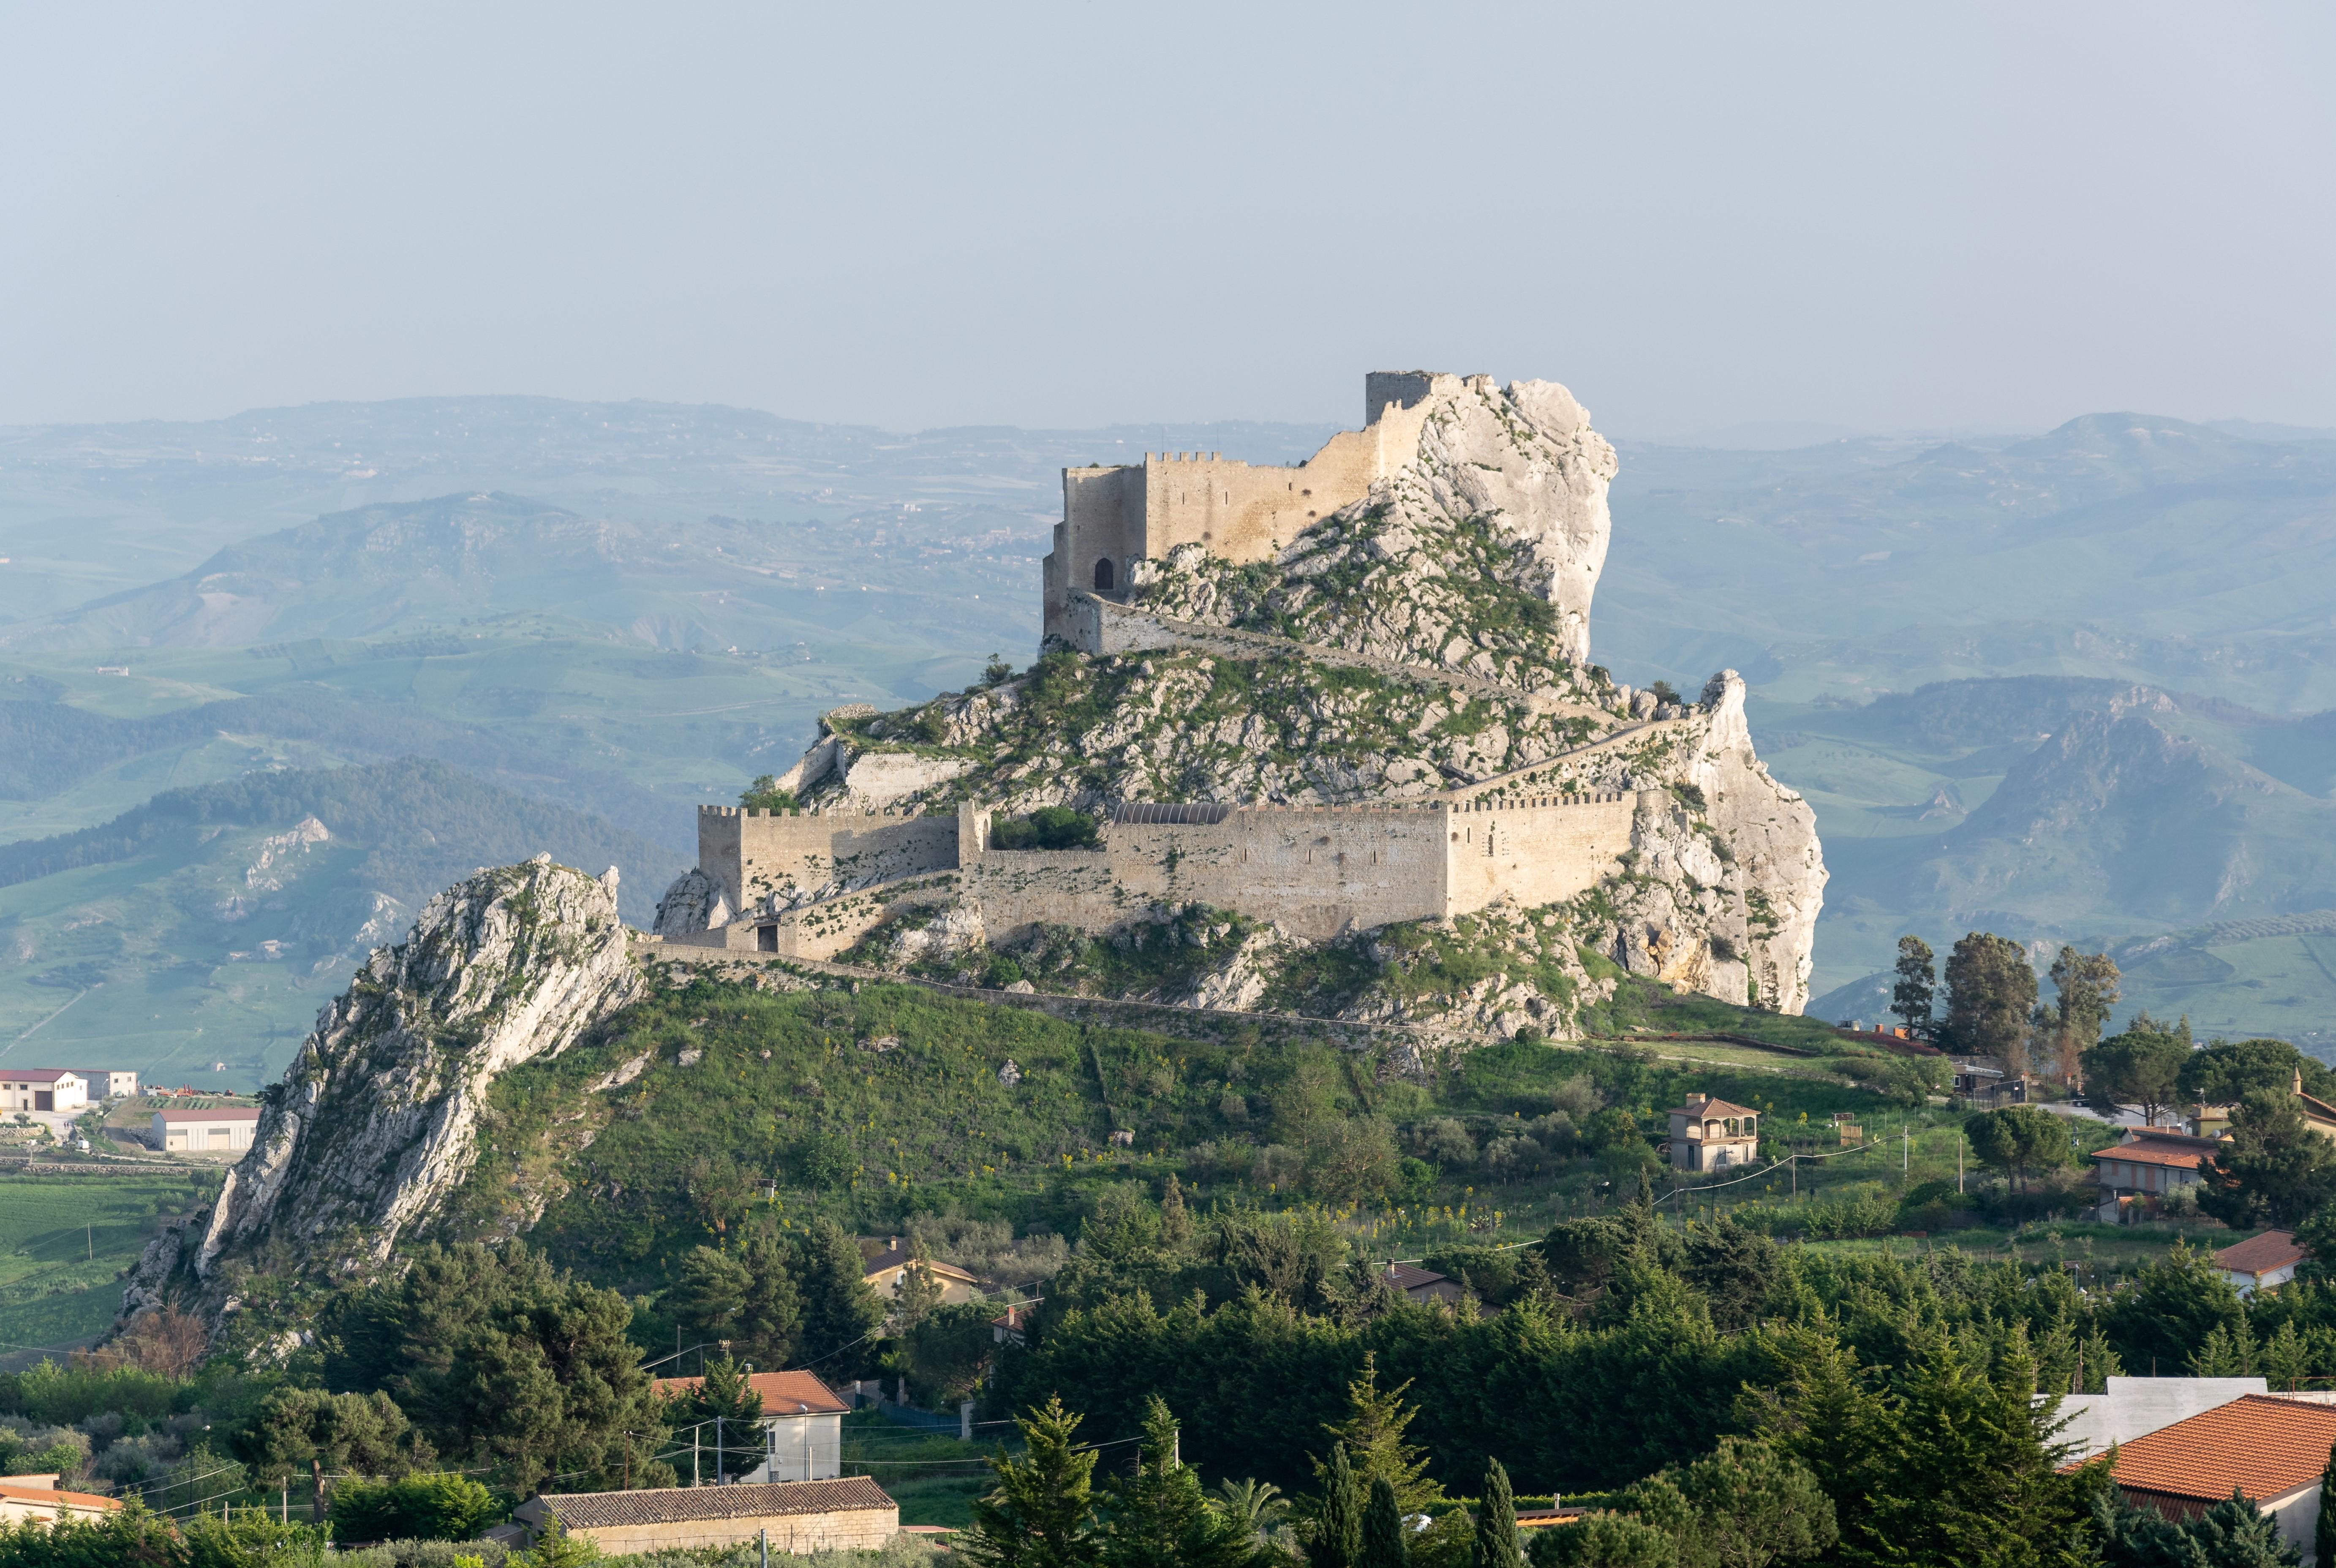 Mussomeli, Castello Manfredonico